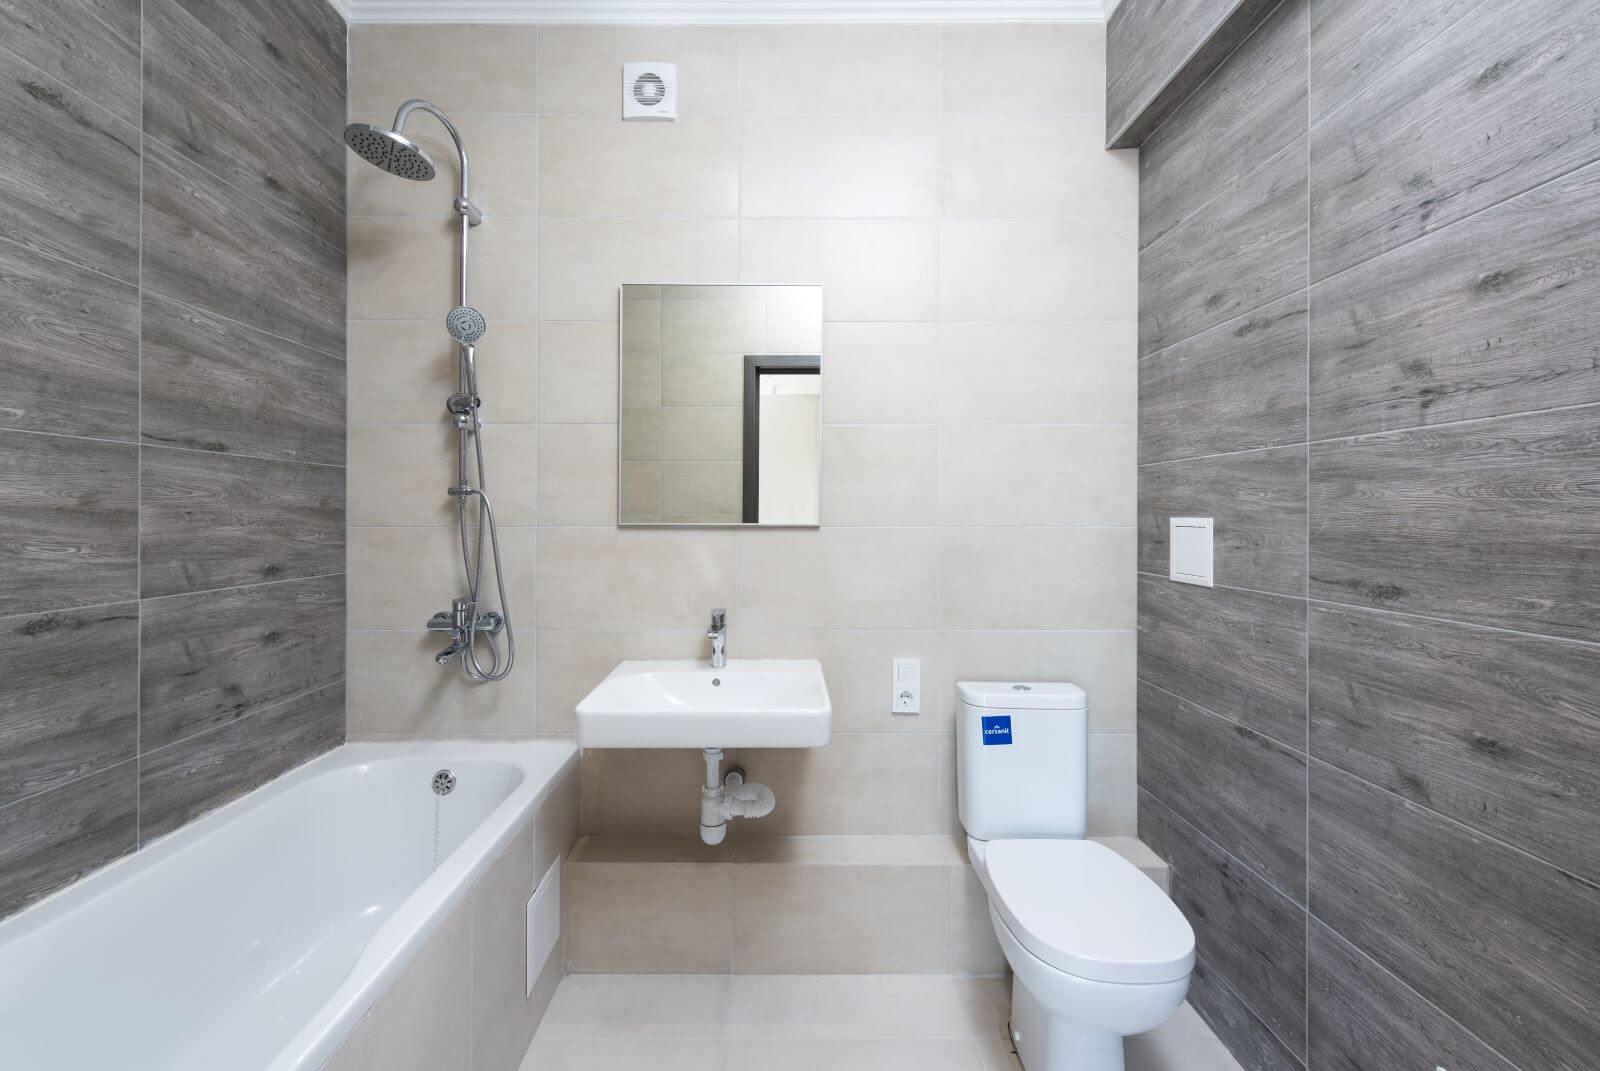 baño sin ventanas